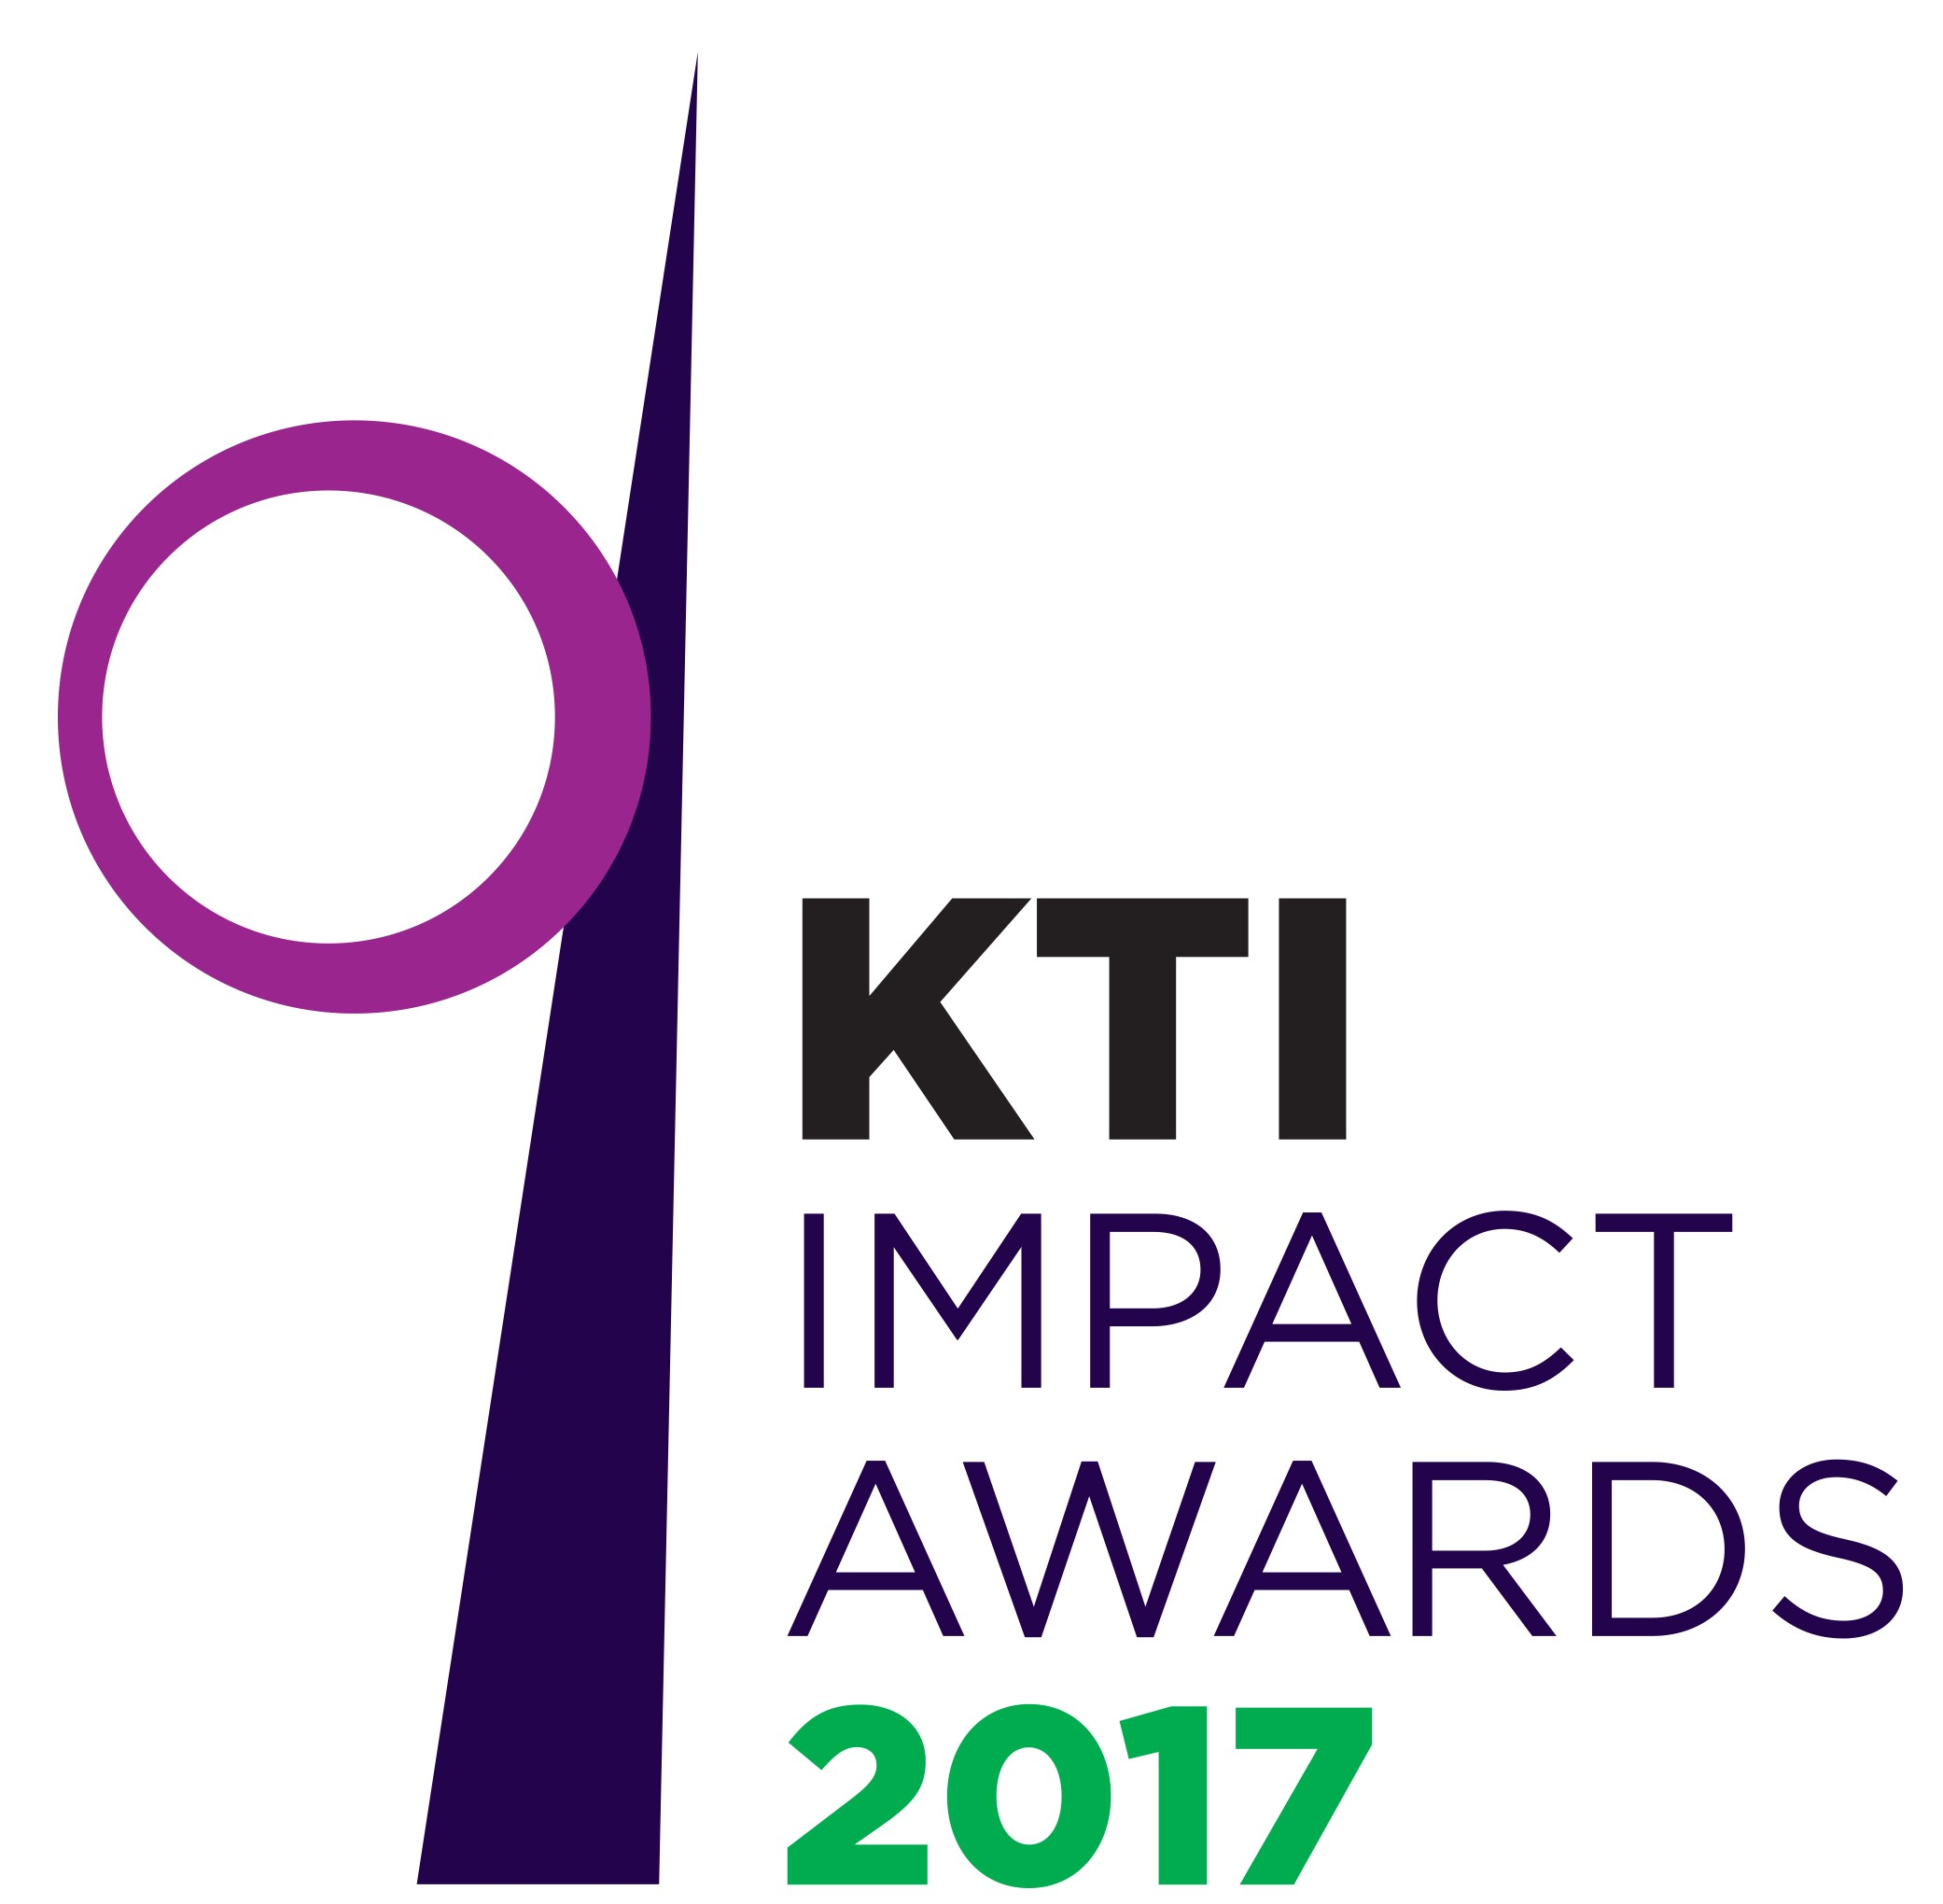 KTI Impact Awards 2017